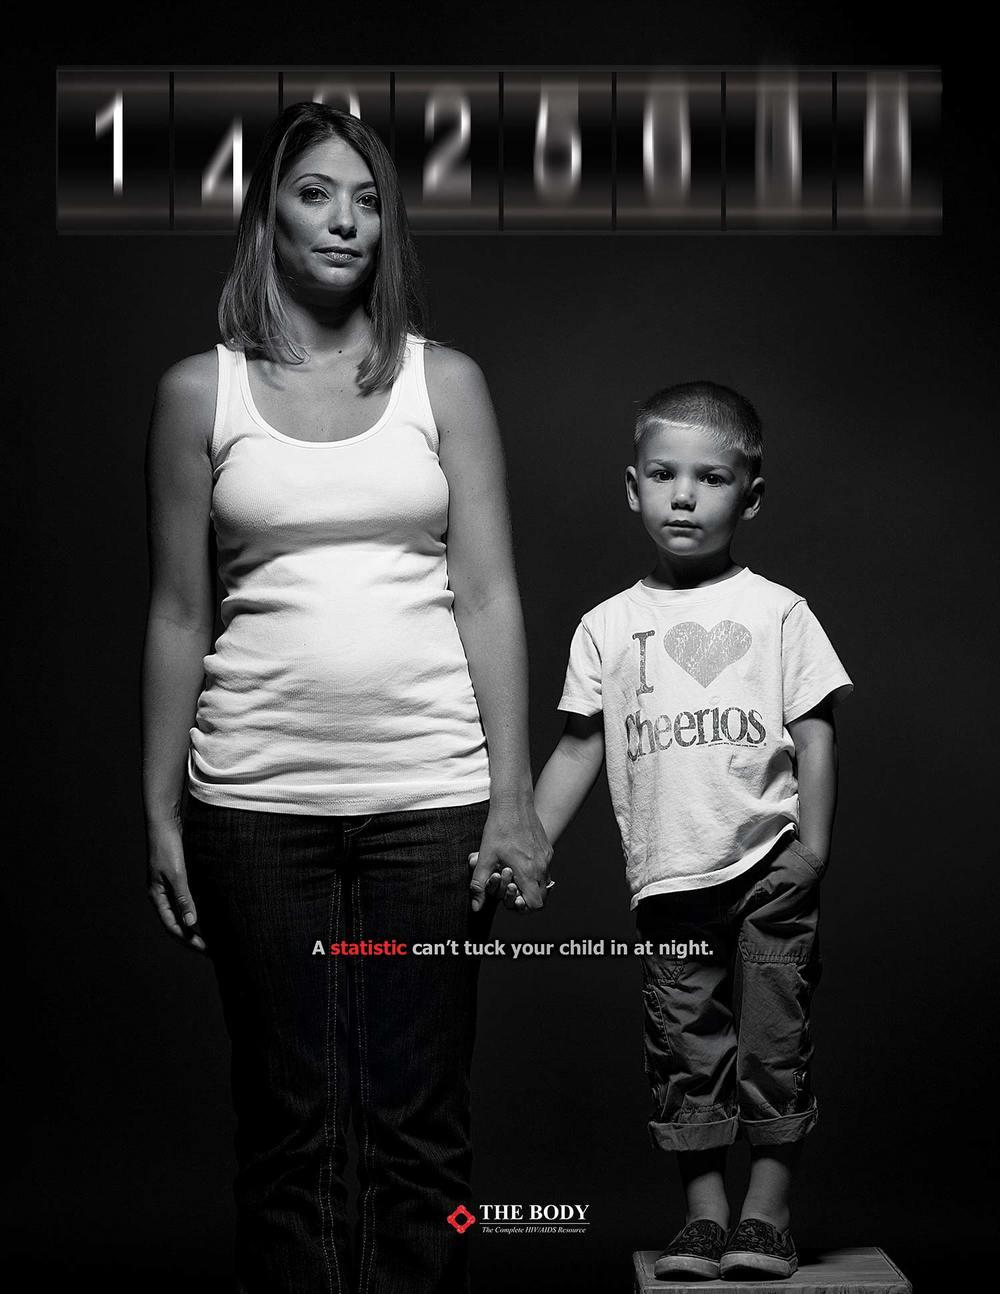 HIV_v7-web.jpg